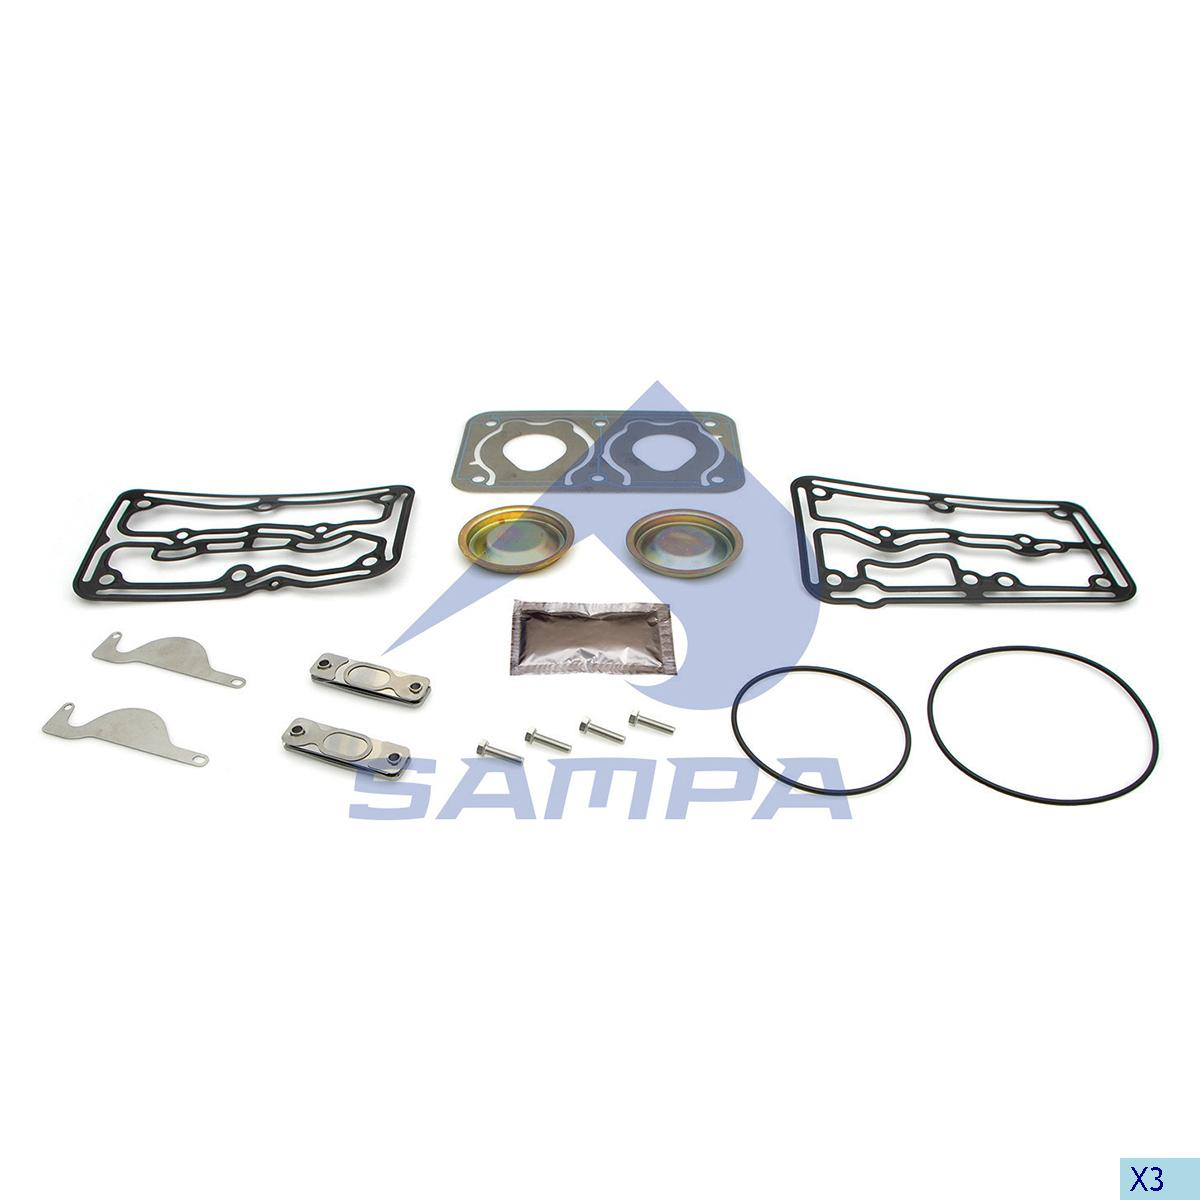 Repair Kit, Compressor, R.V.I., Compressed Air System